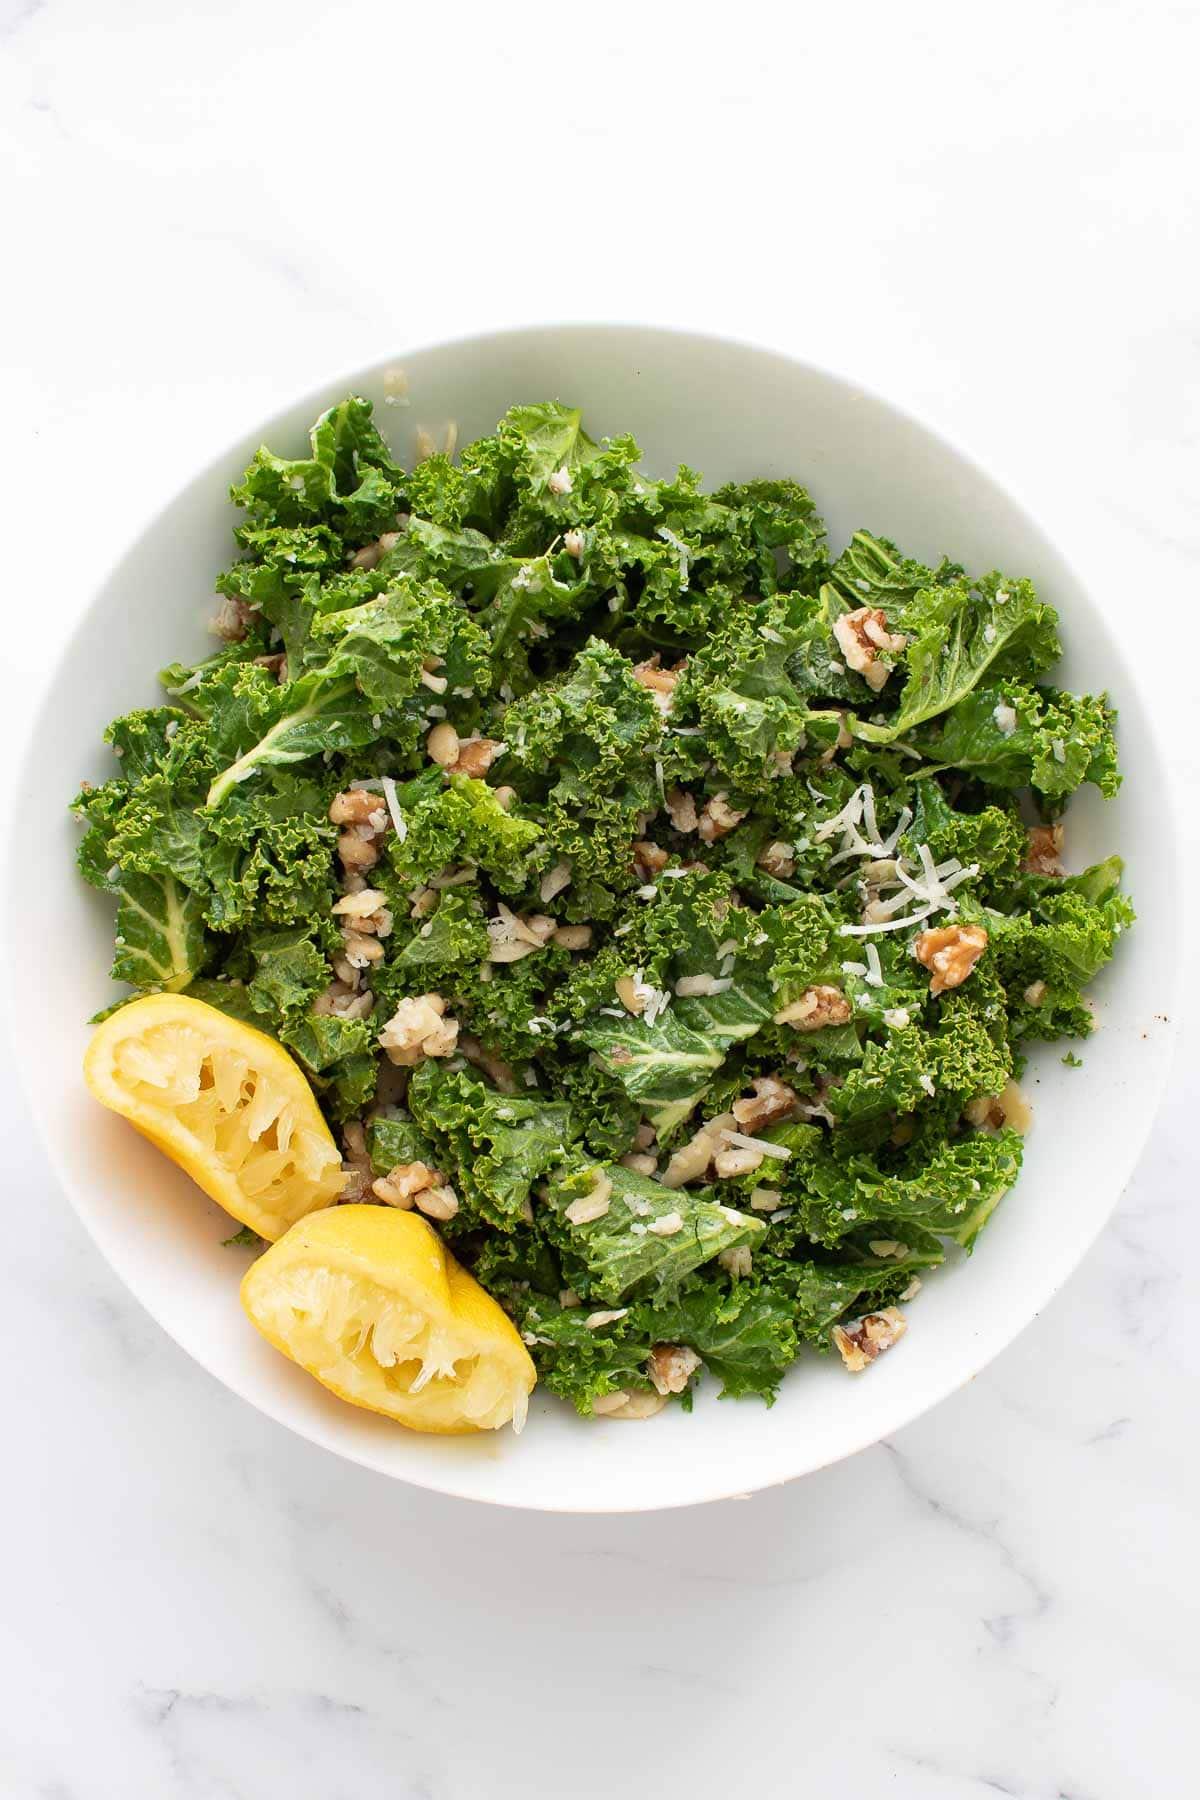 Lemon kale salad in a bowl, with lemon on the side.